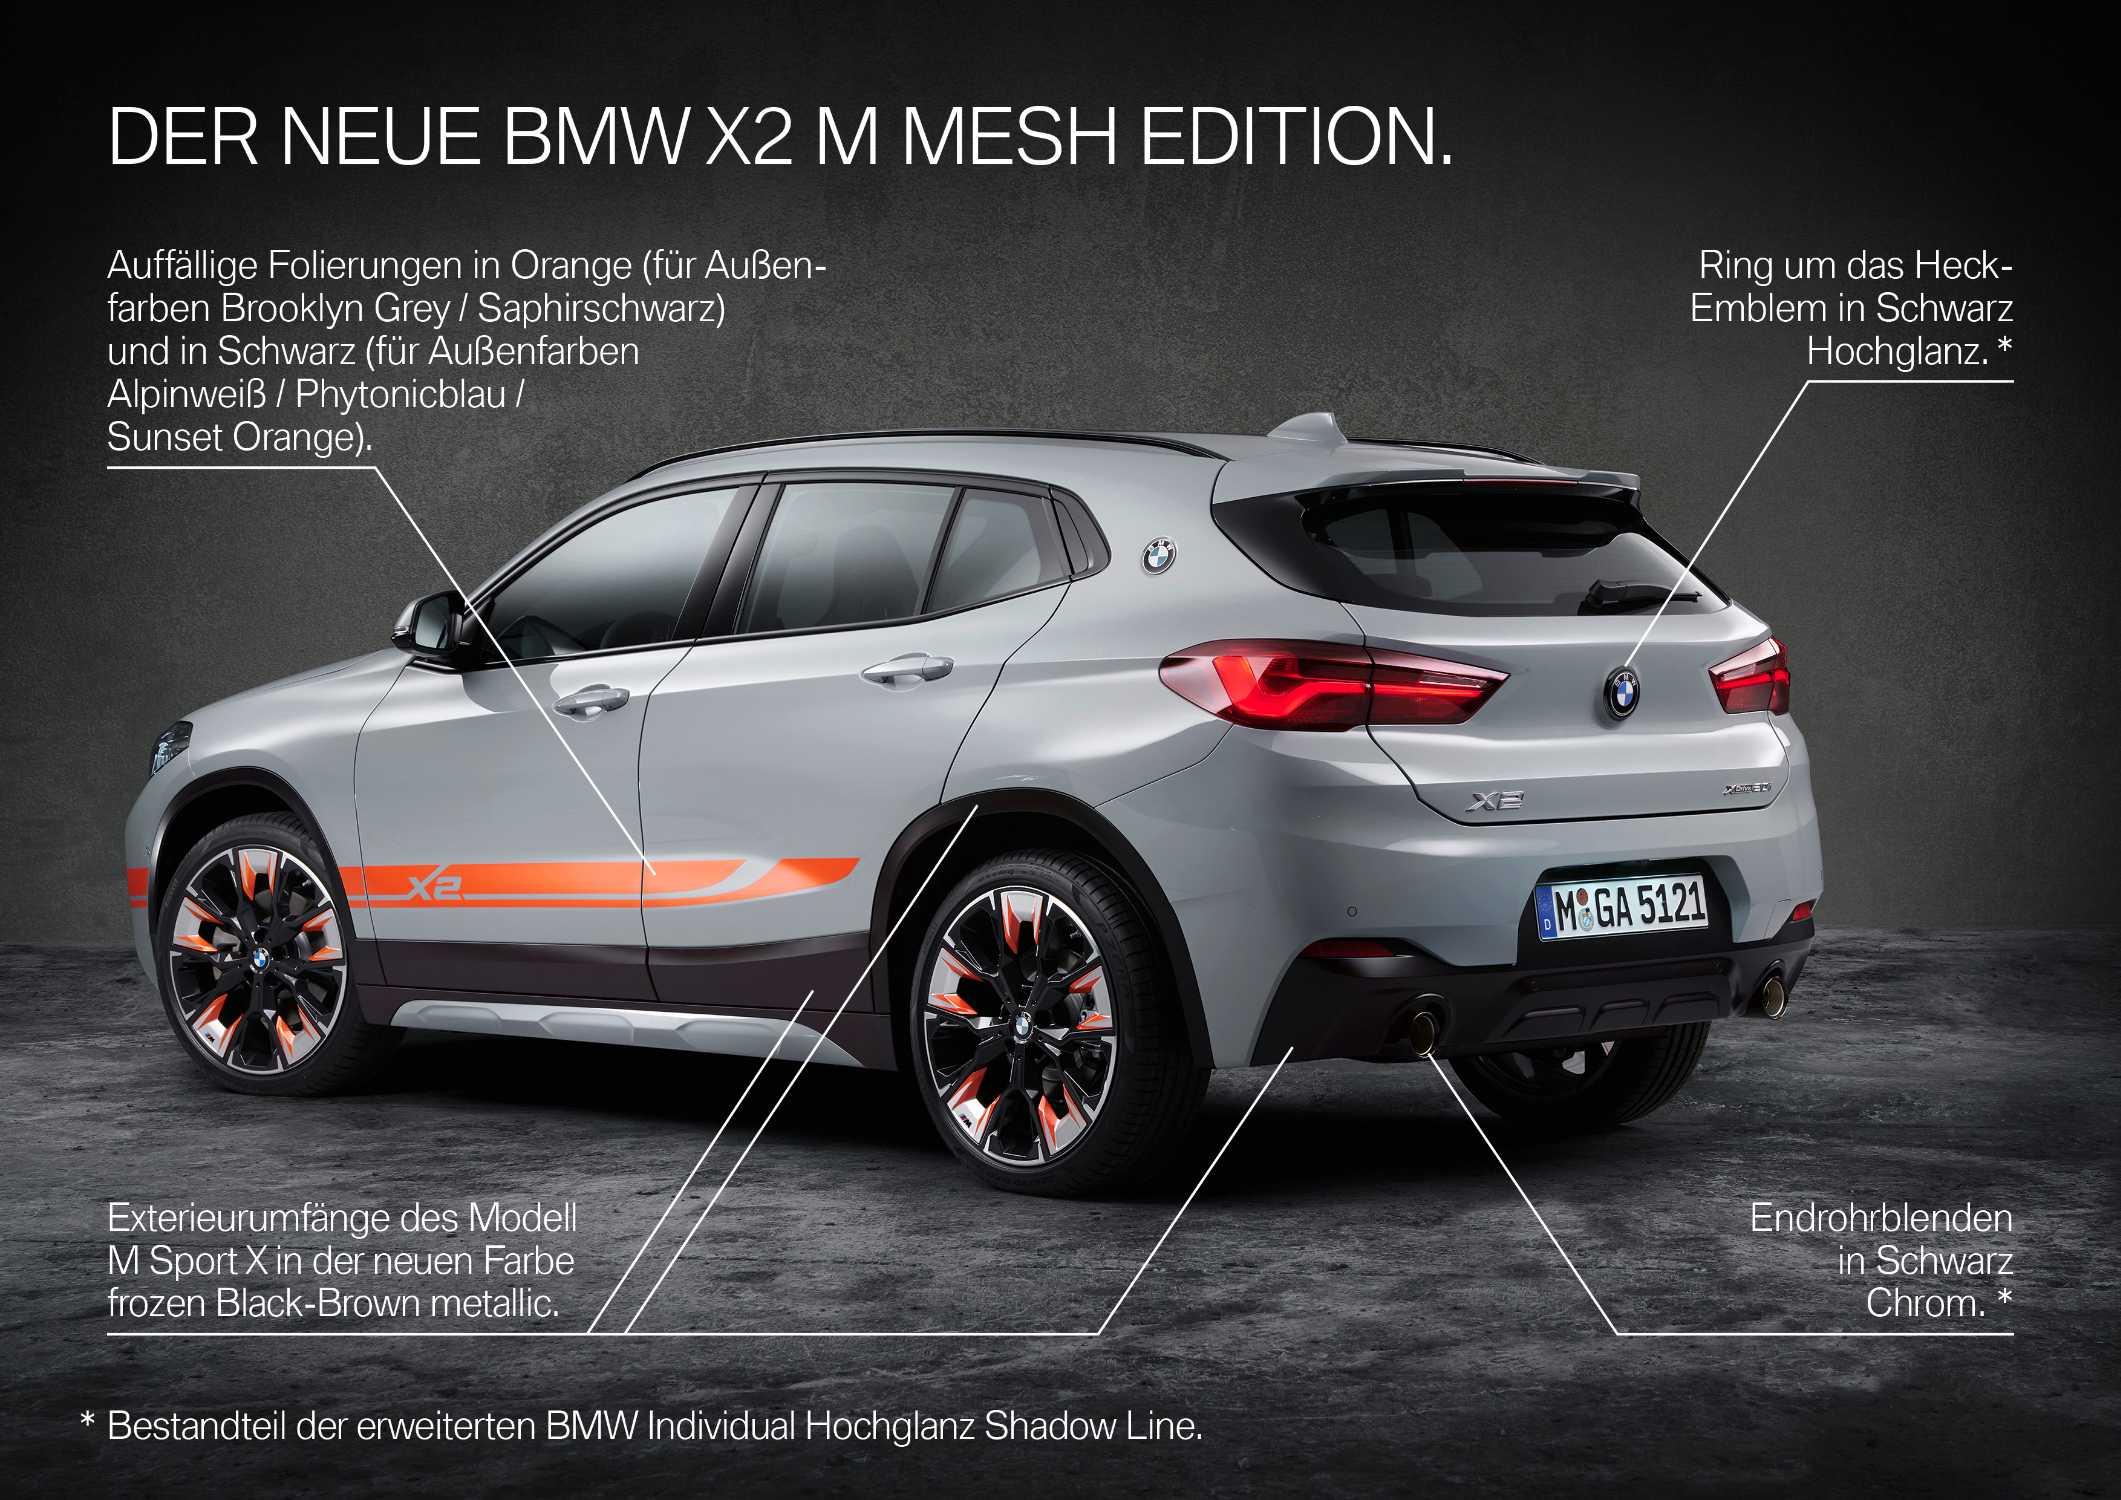 Der neue BMW X2 xDrive20i M Mesh Edition (09/2020).